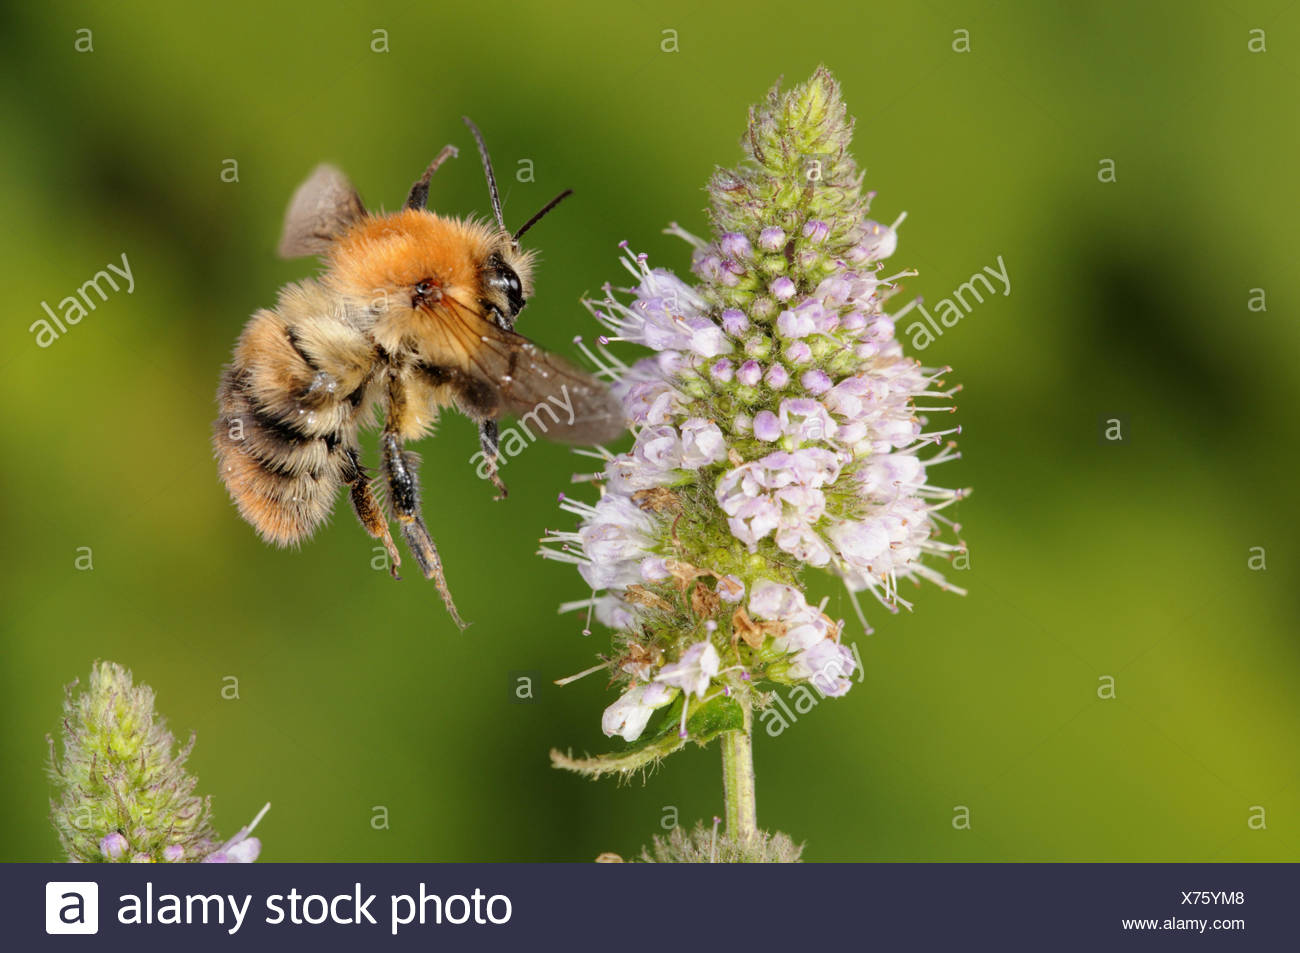 Gemeinsamen Carder Bee - Bombus pascuorum Stockbild